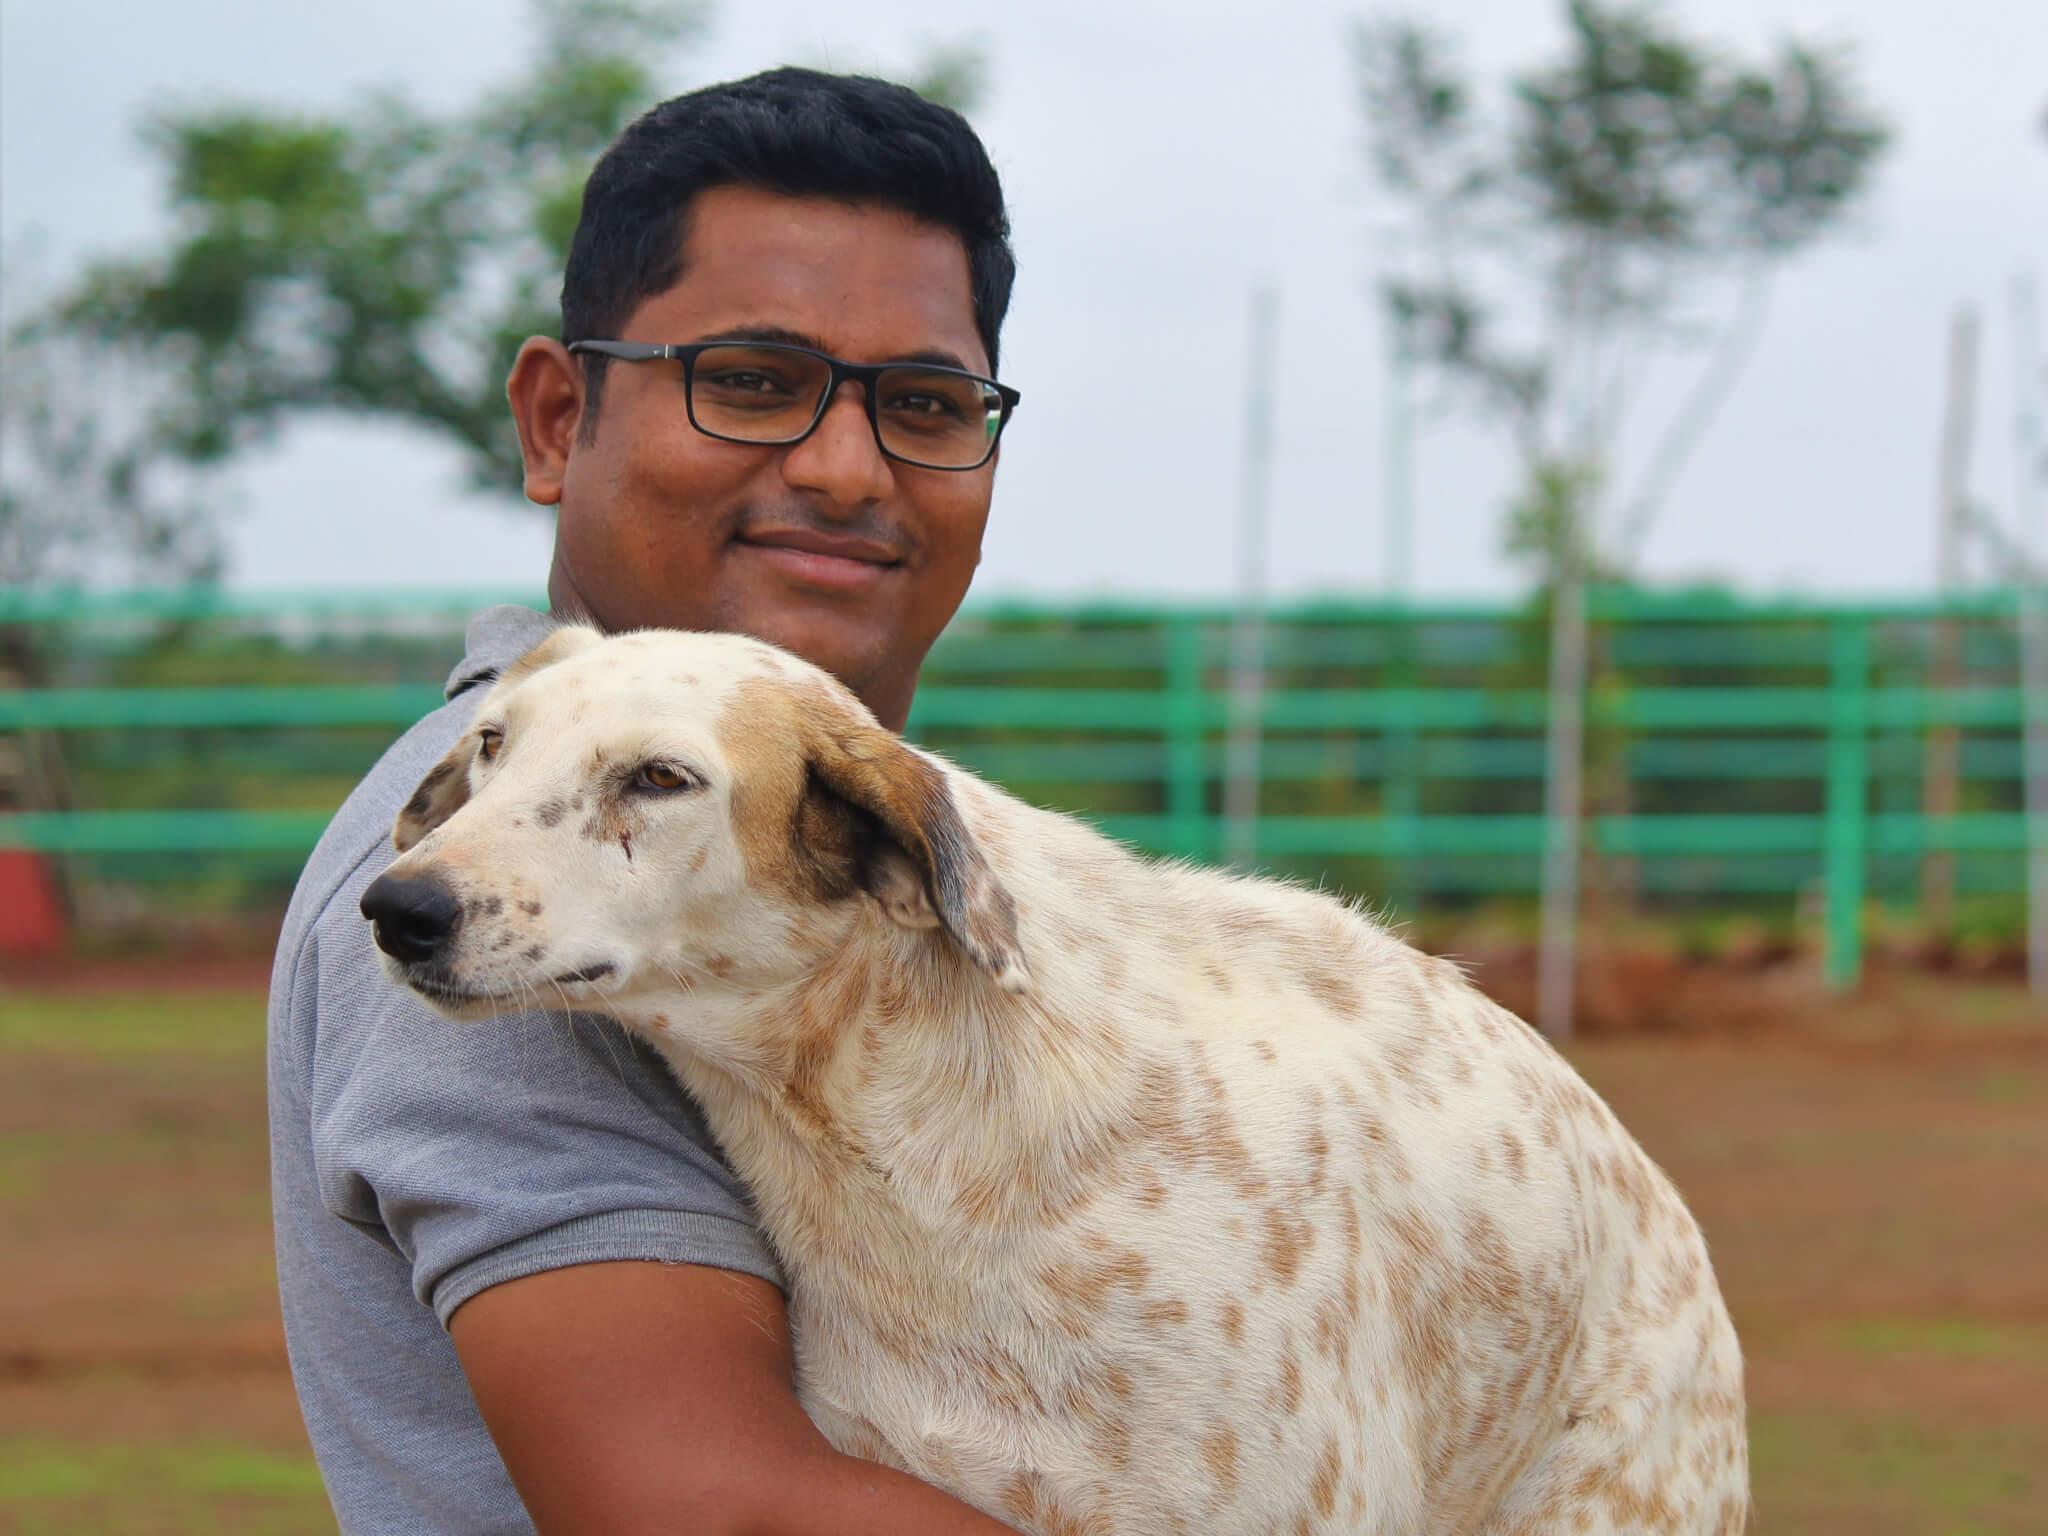 Koustubh Pol holds sanctuary resident Tommy the dog.